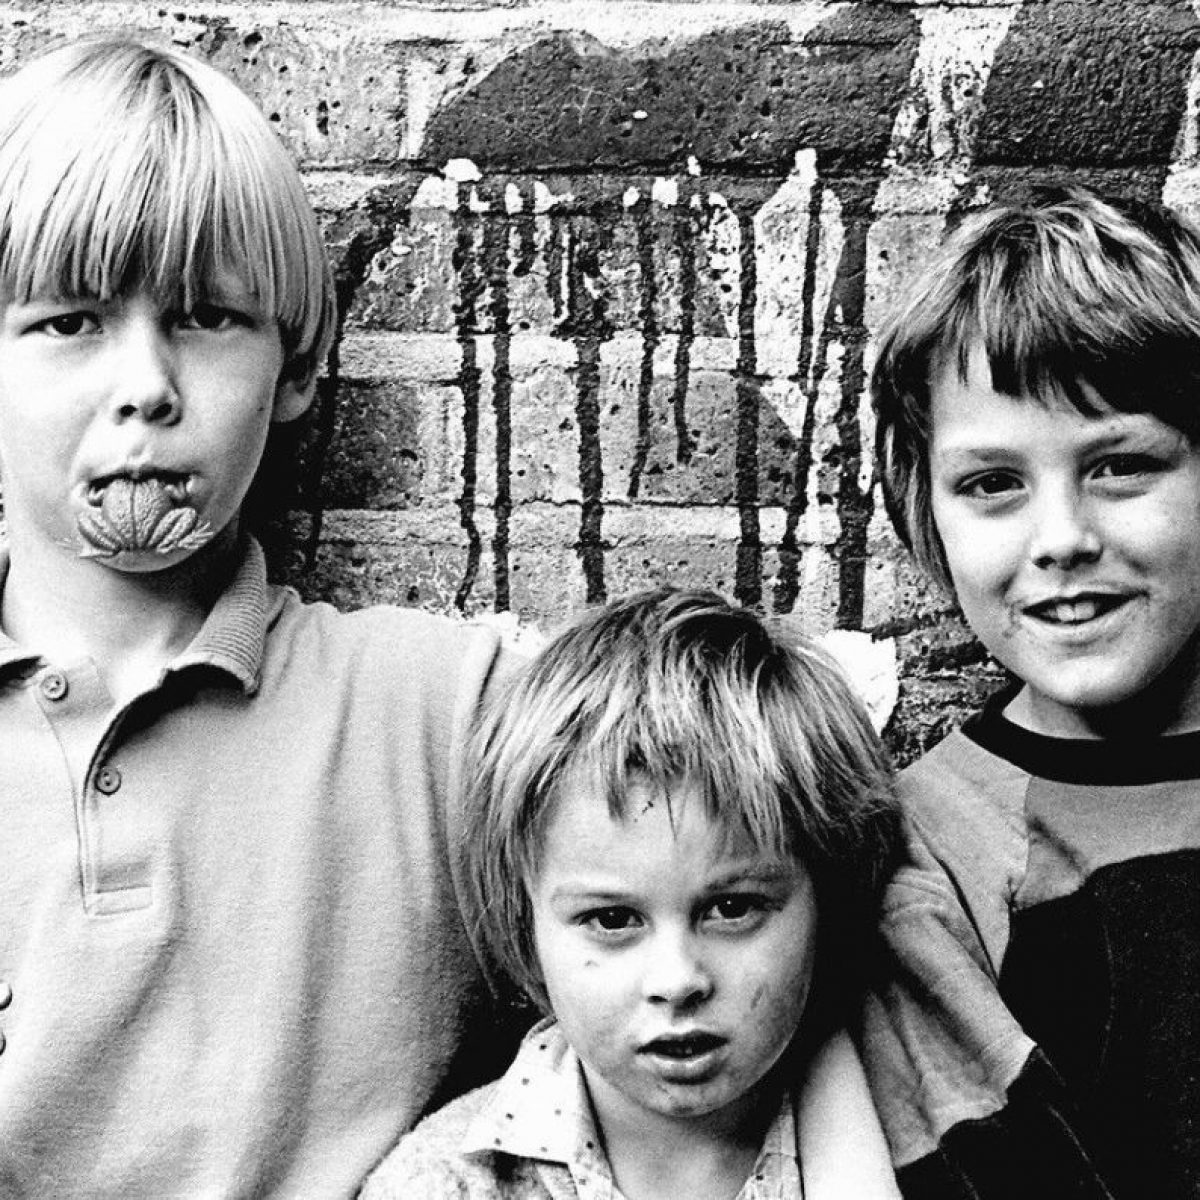 Kids in Hoxton, 1980s. Photo © Wayne Waterson.